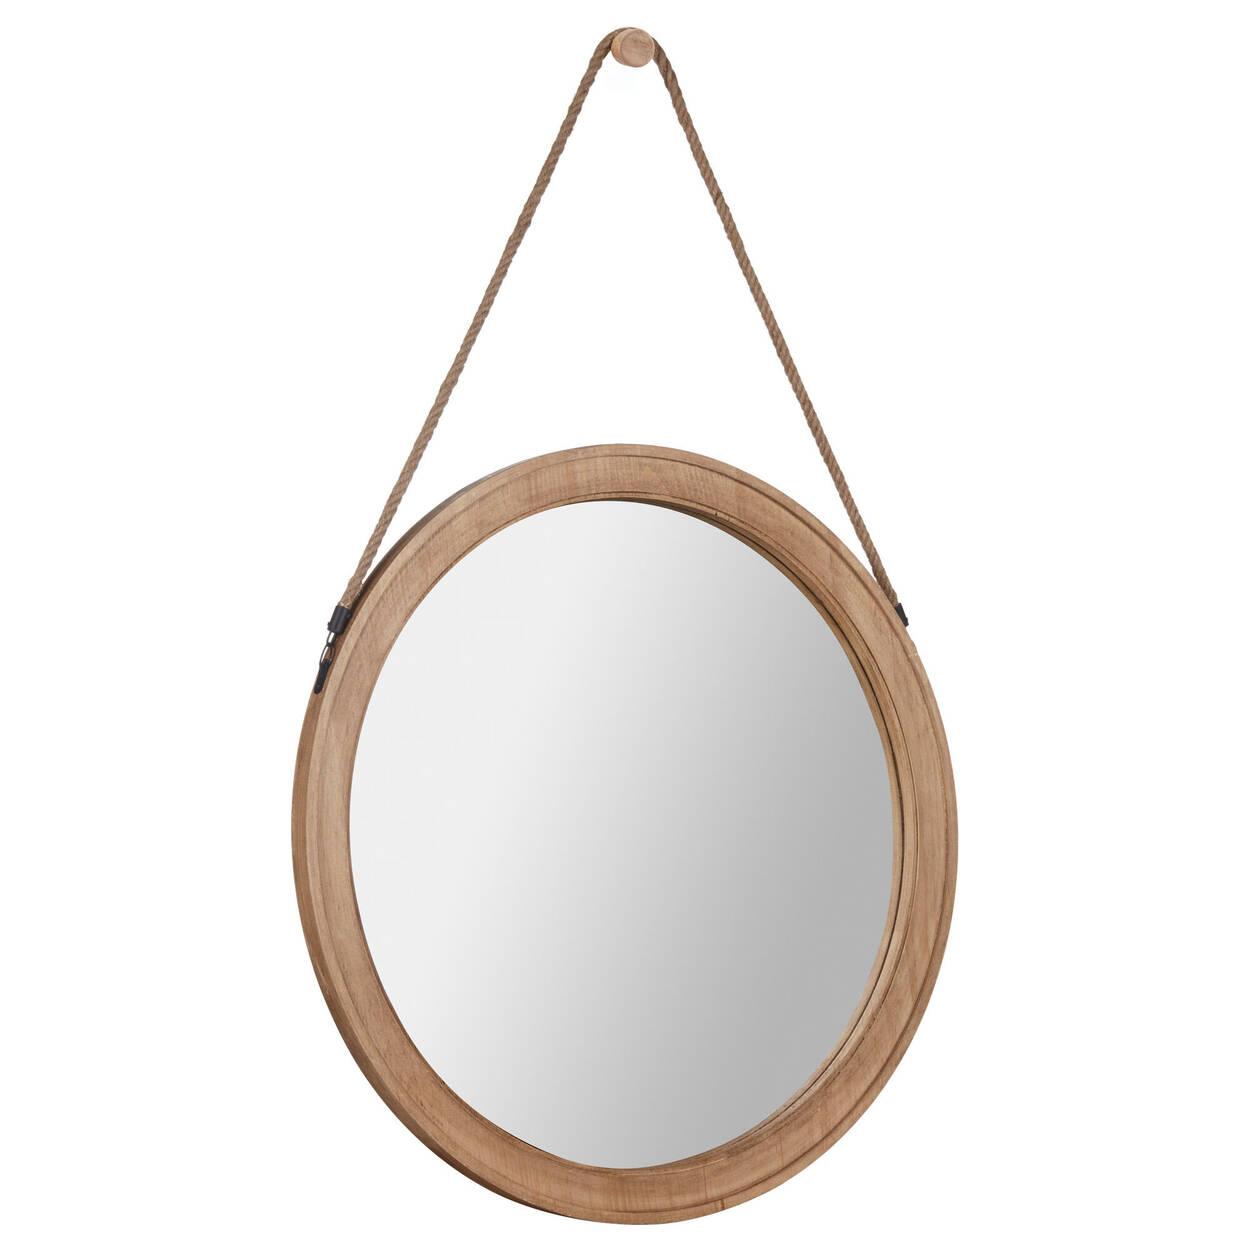 Miroir rond suspendu avec corde